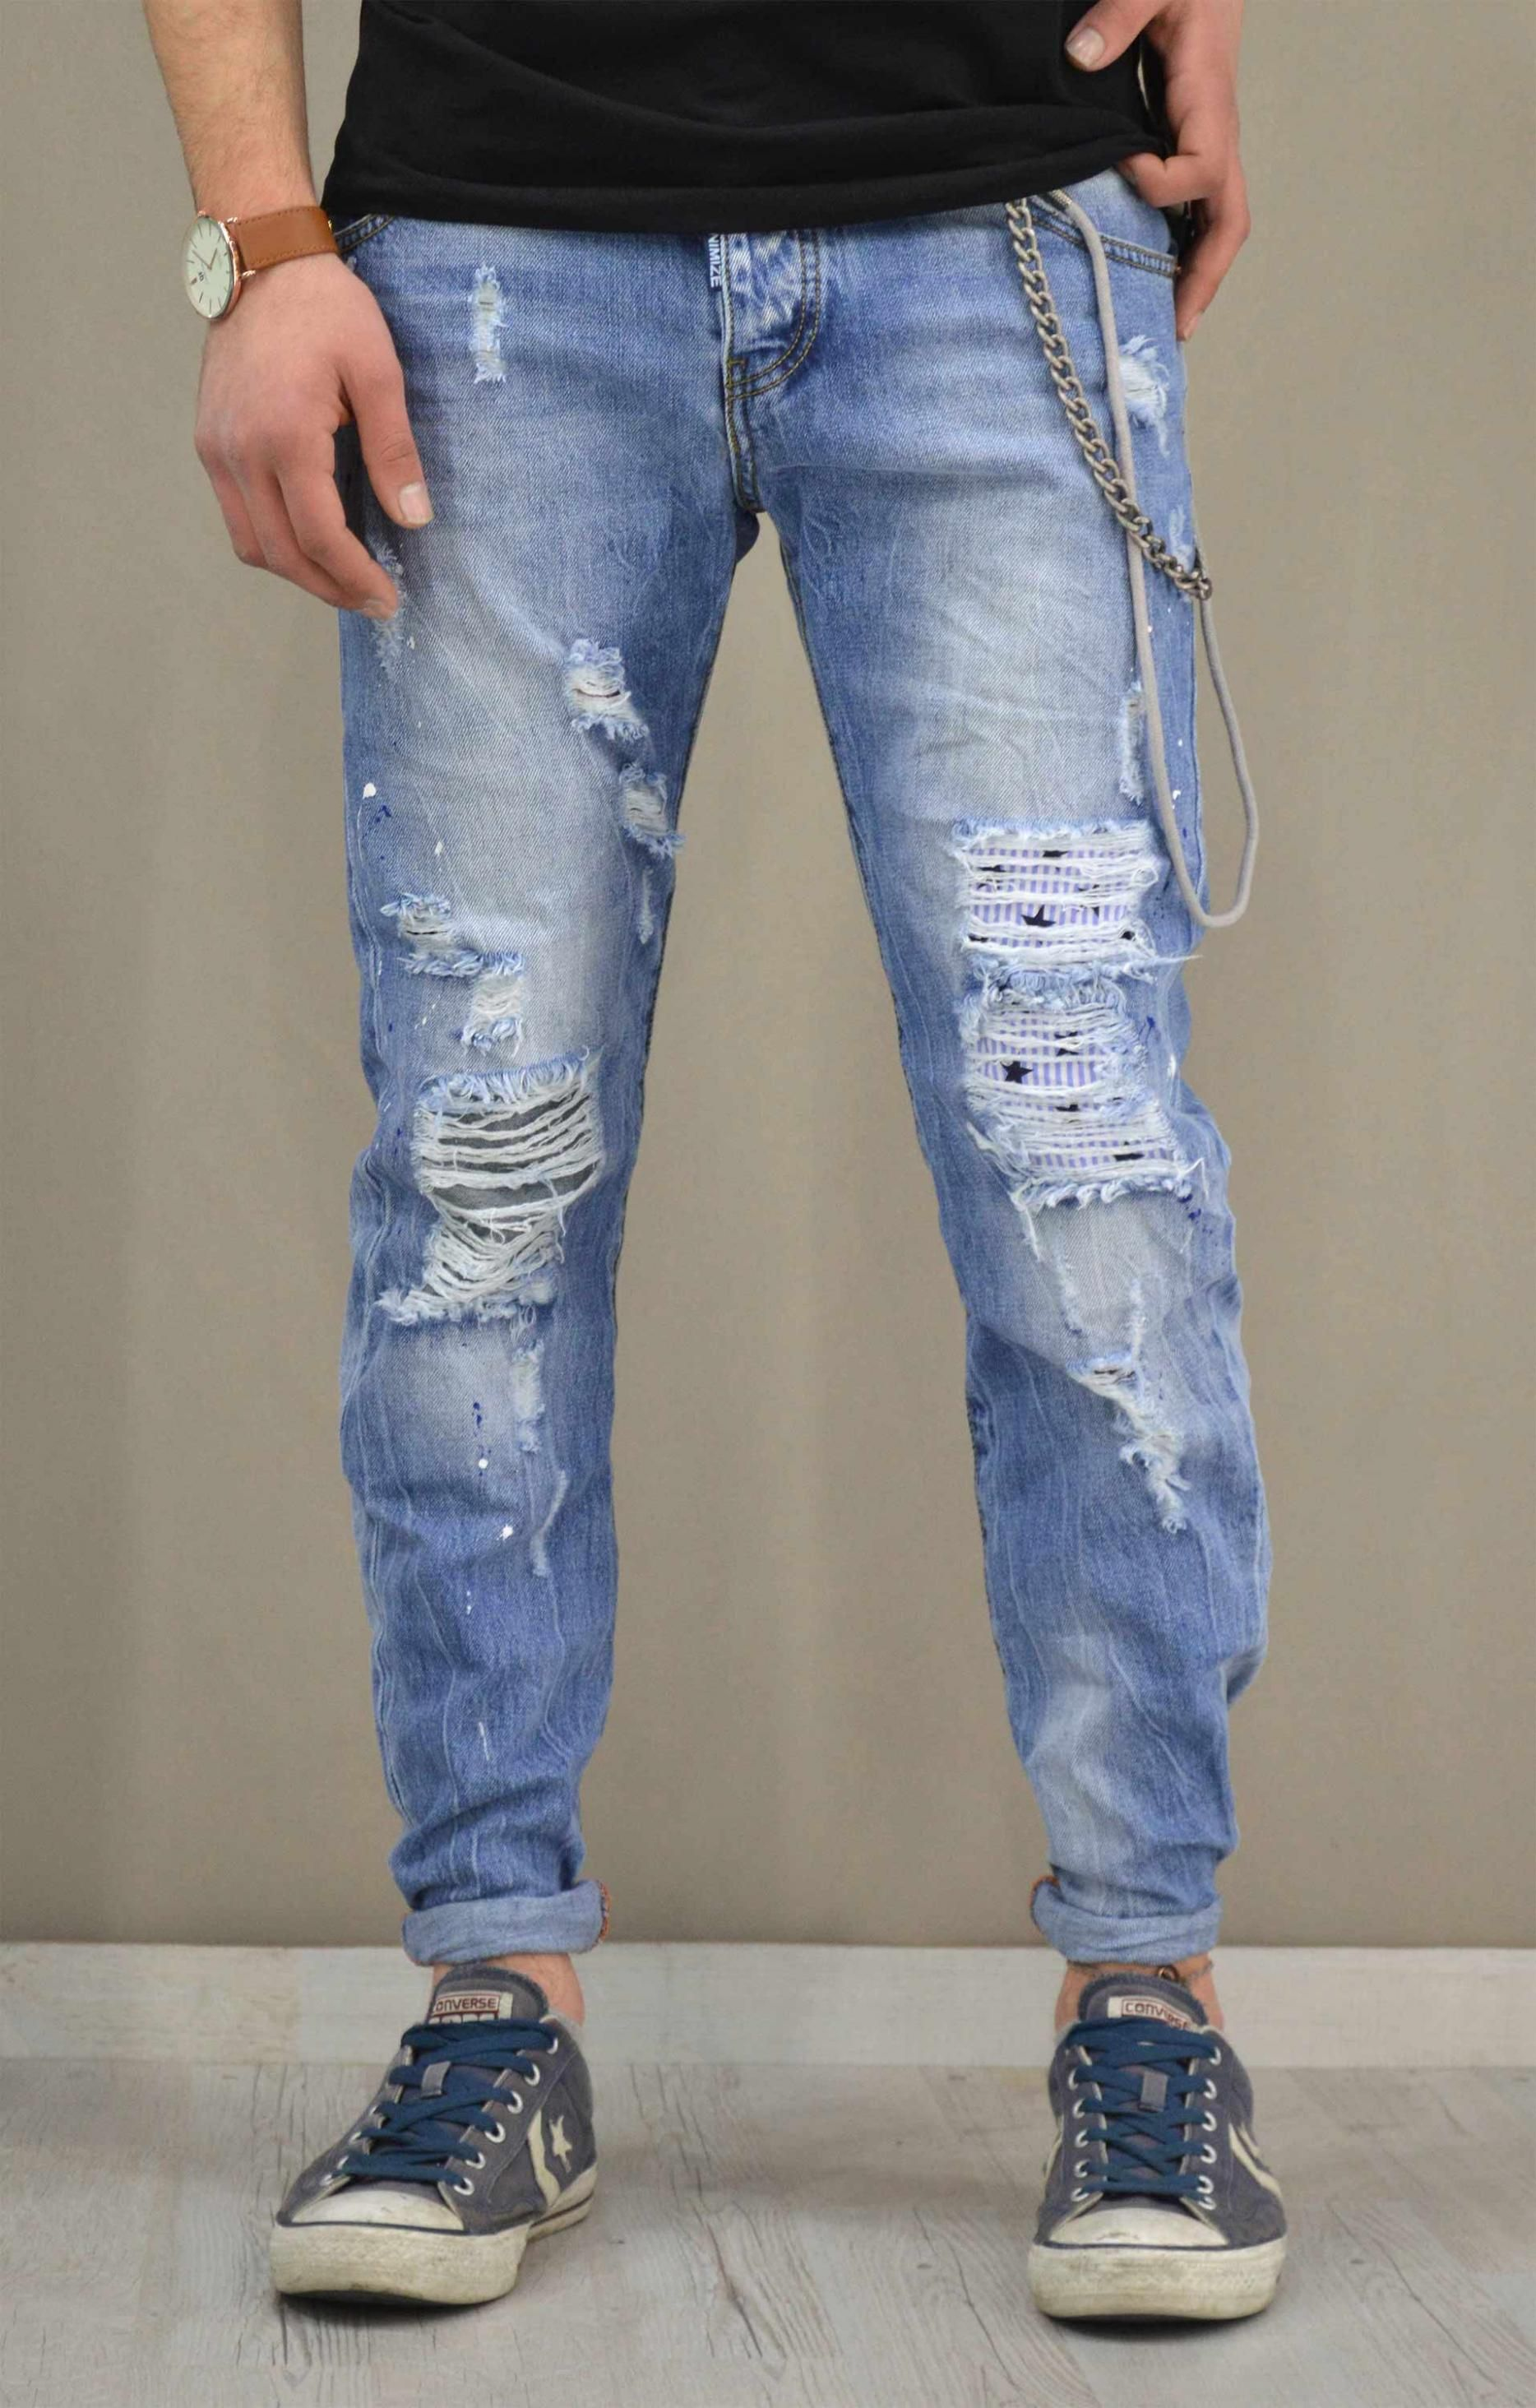 36f7c973b384 Ανδρικό παντελόνι denim ξεβαμμένο